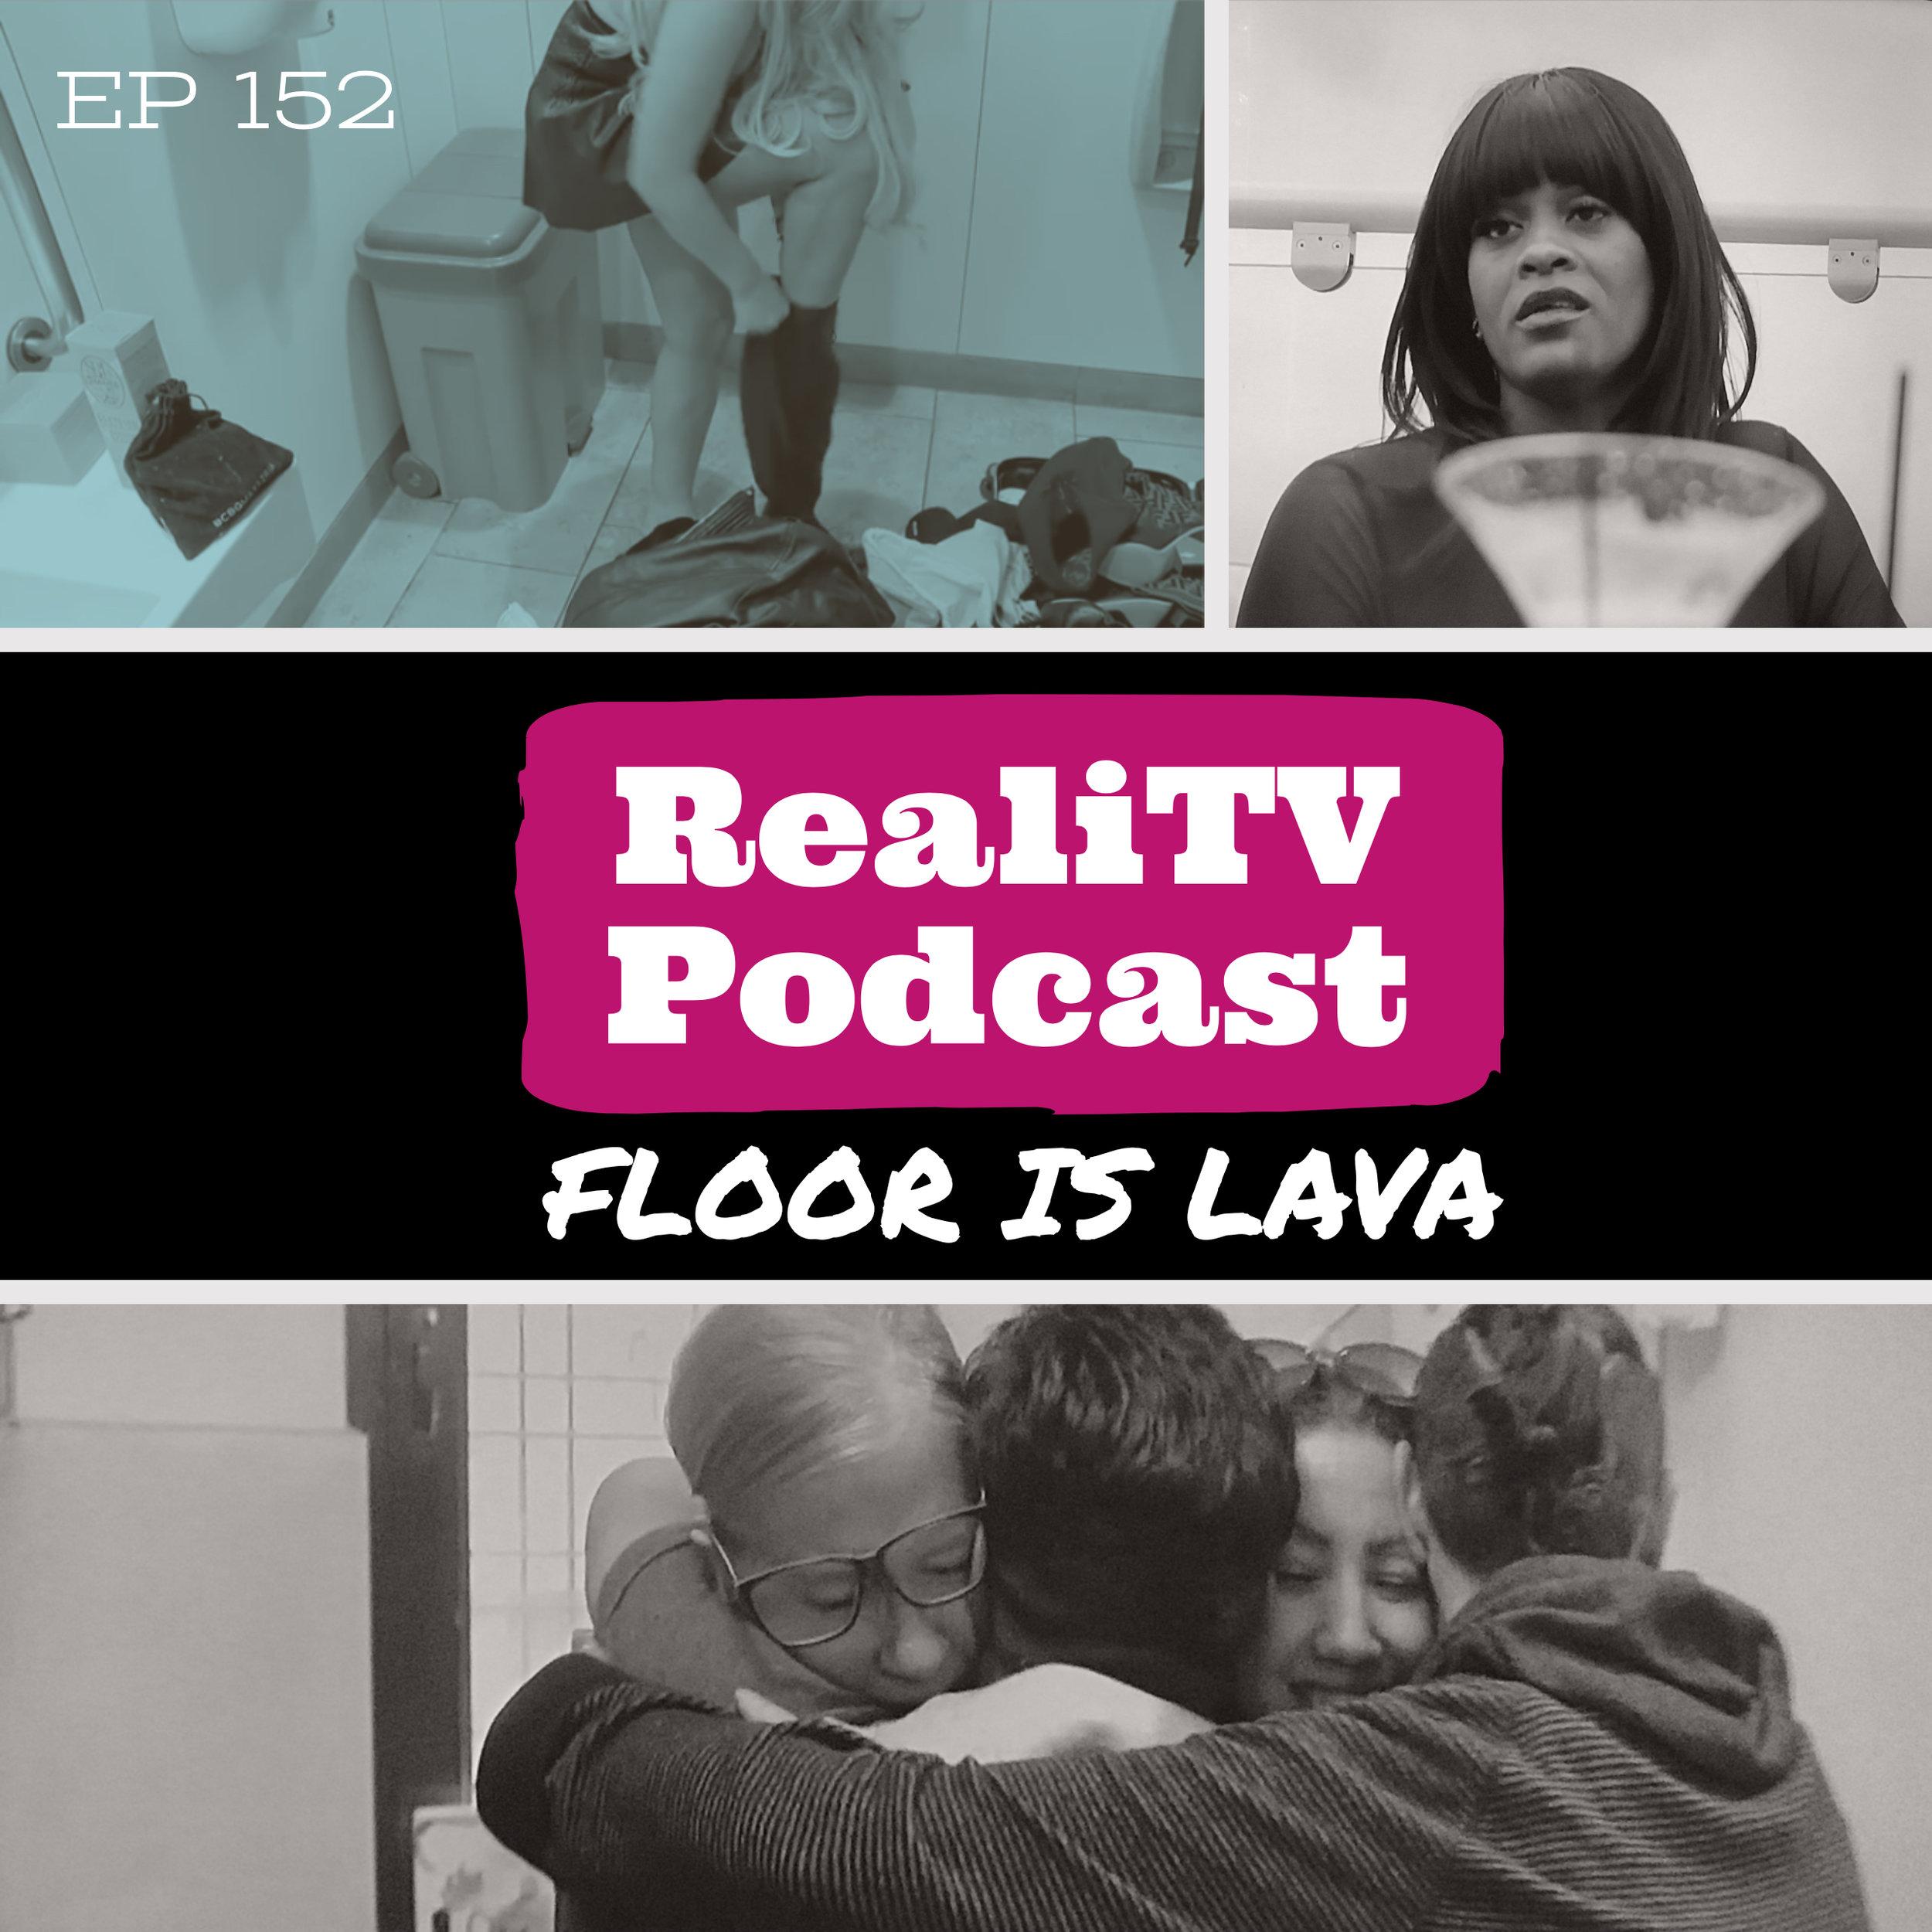 RealiTV Podcast